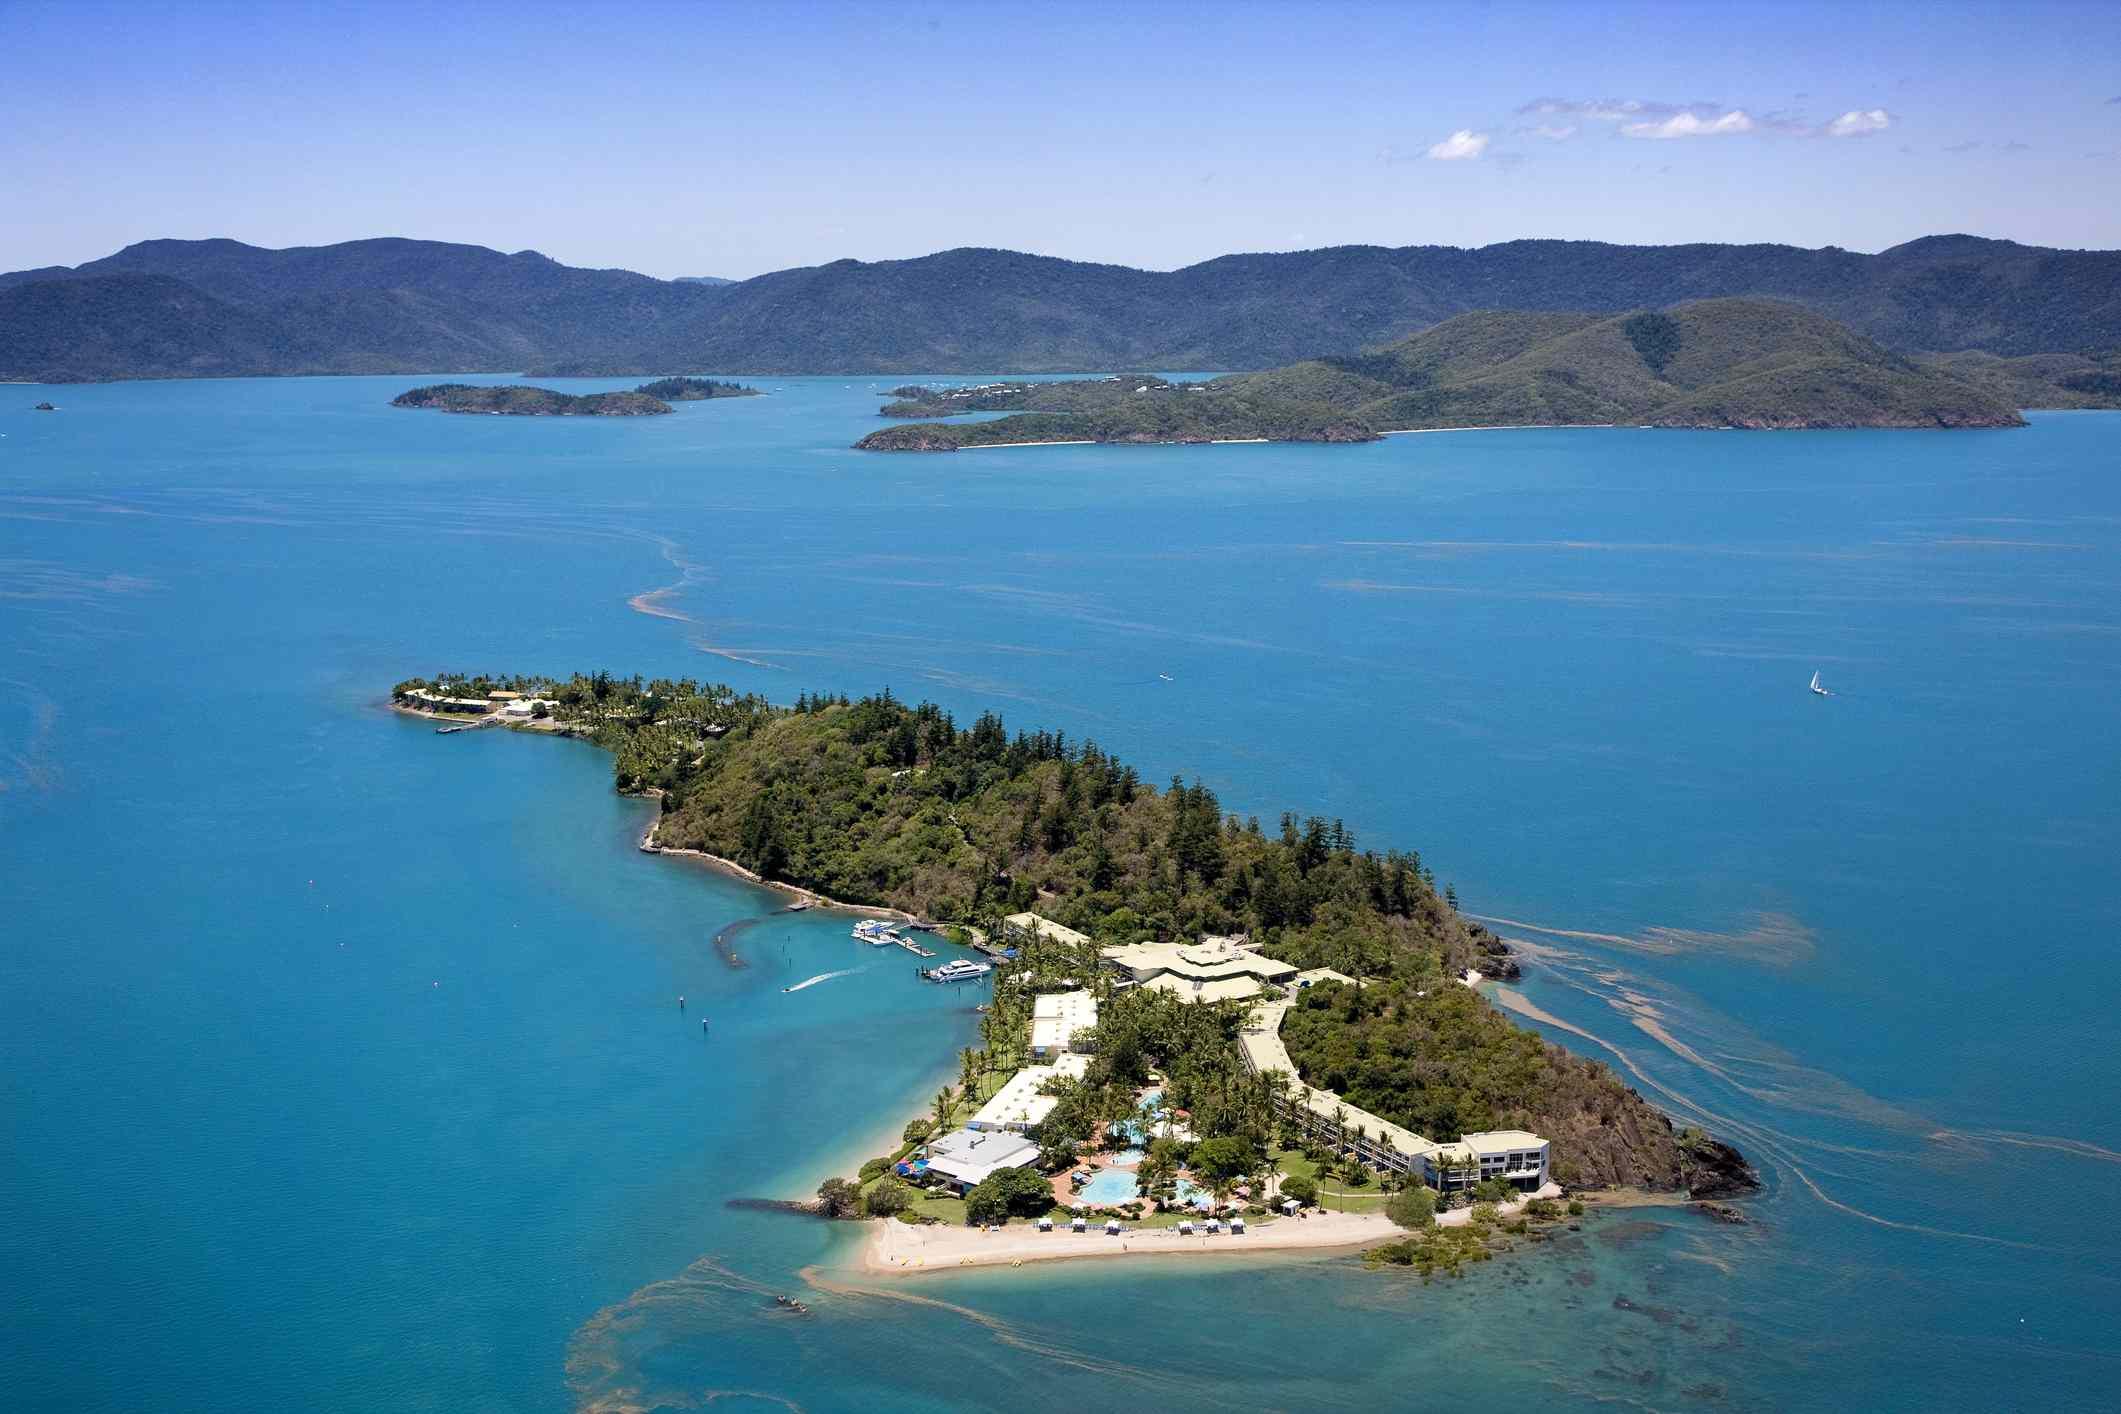 Aerial view of Daydream Island, Whitsundays, Queensland, Australia